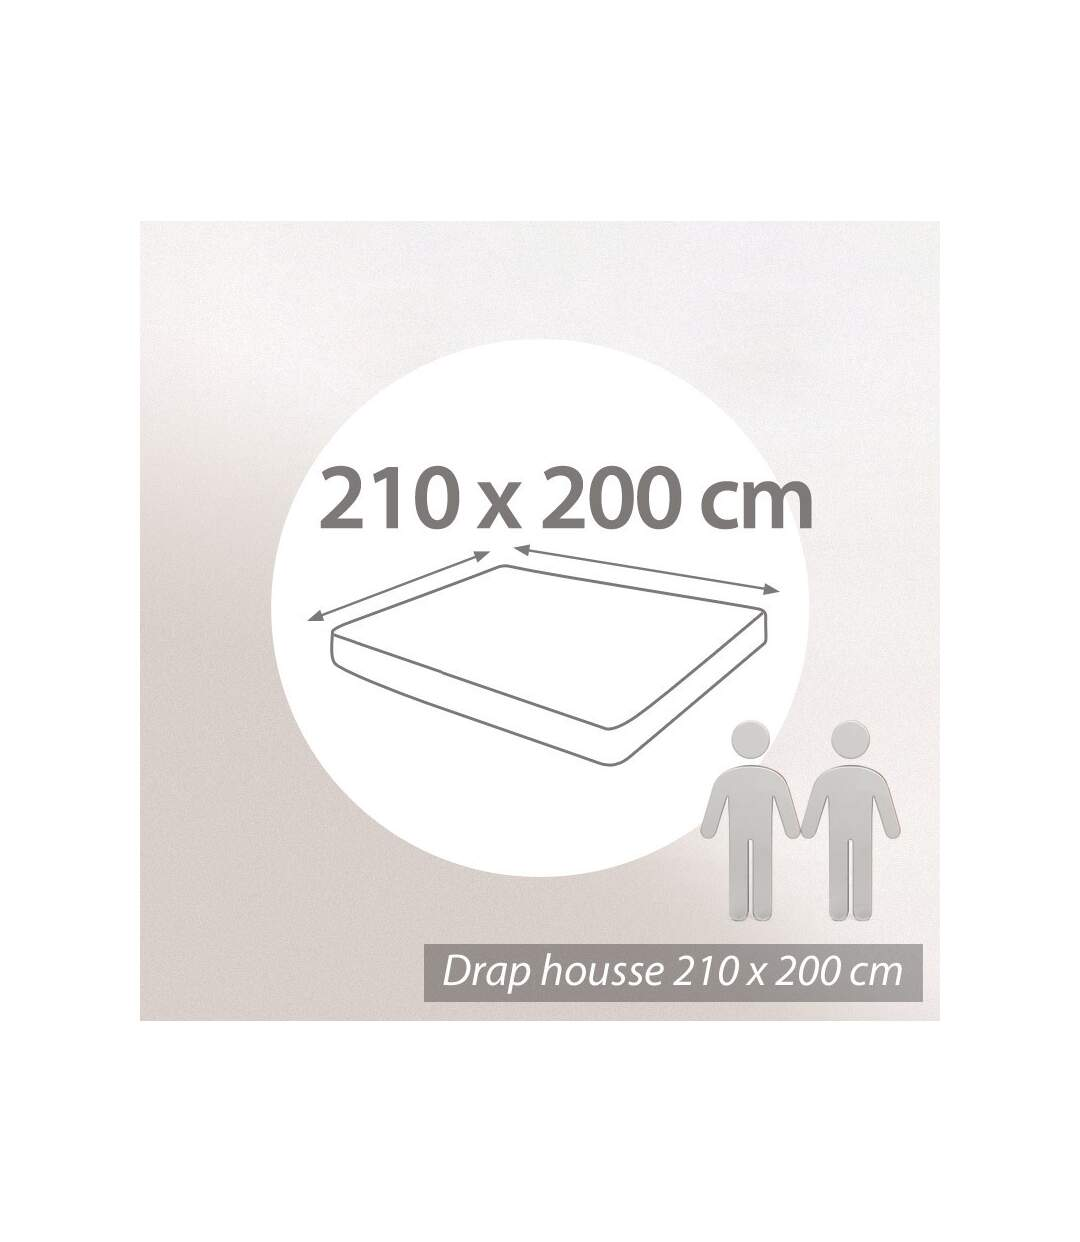 Protège matelas imperméable Antony blanc 210x200